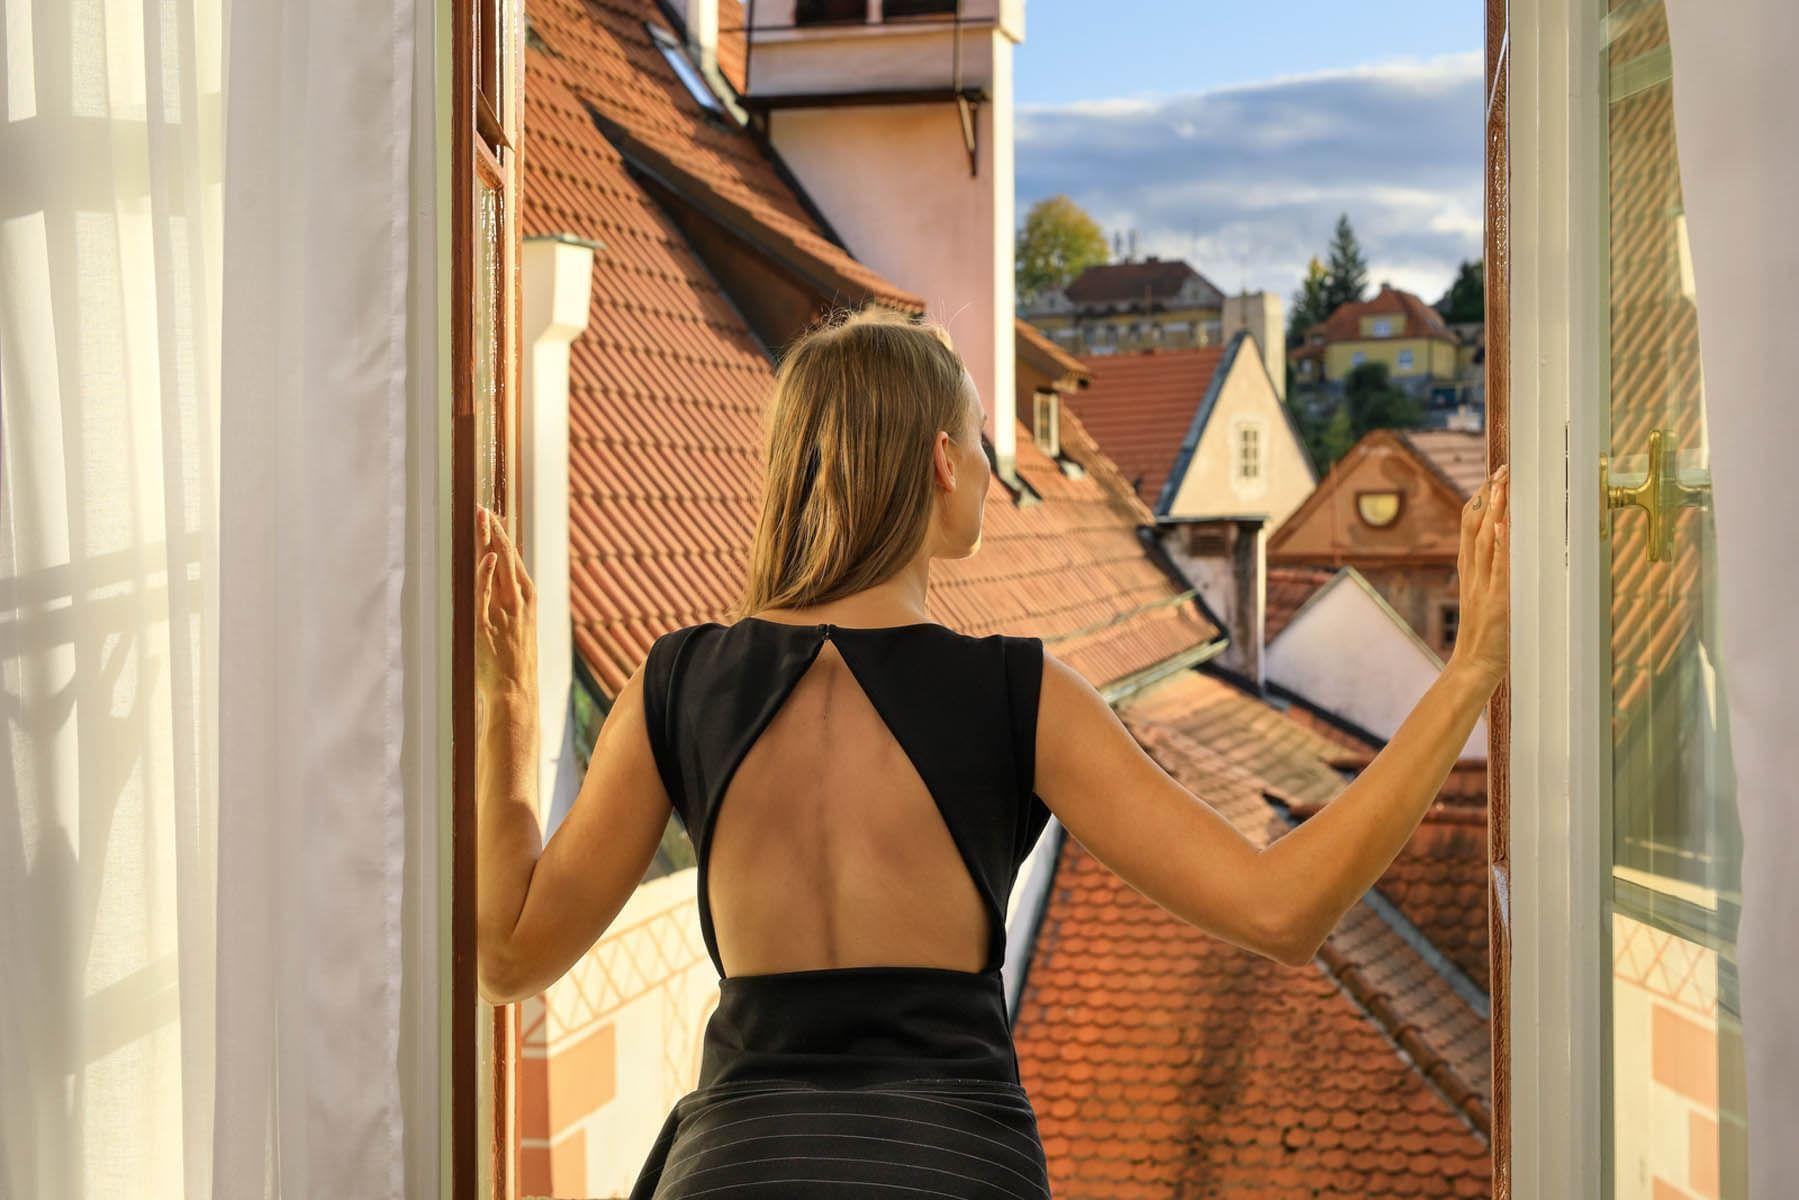 View from deluxe room at Hotel Old Inn, Český Krumlov